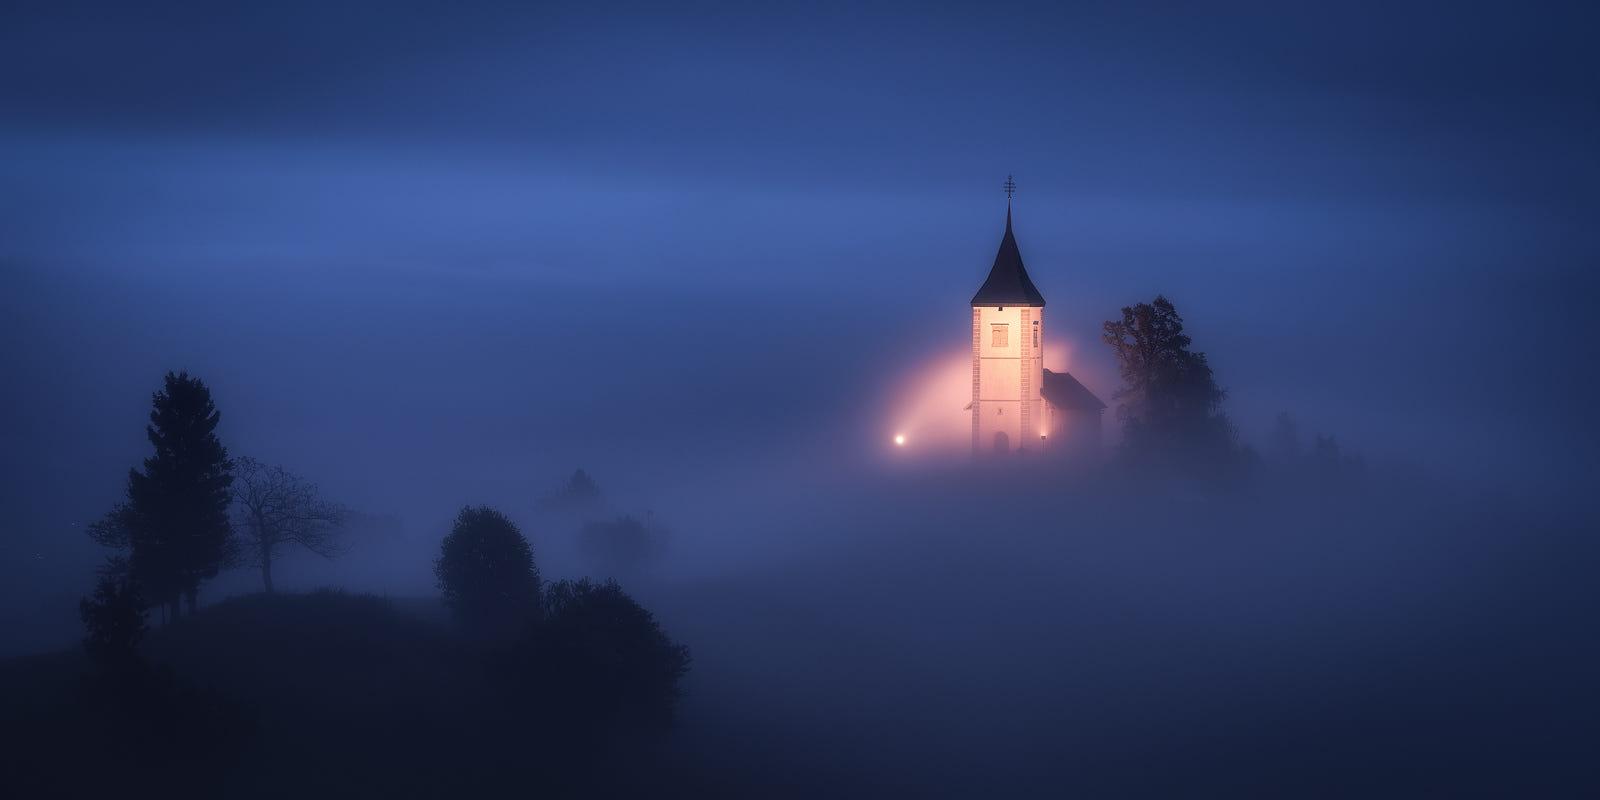 Mysterious Church